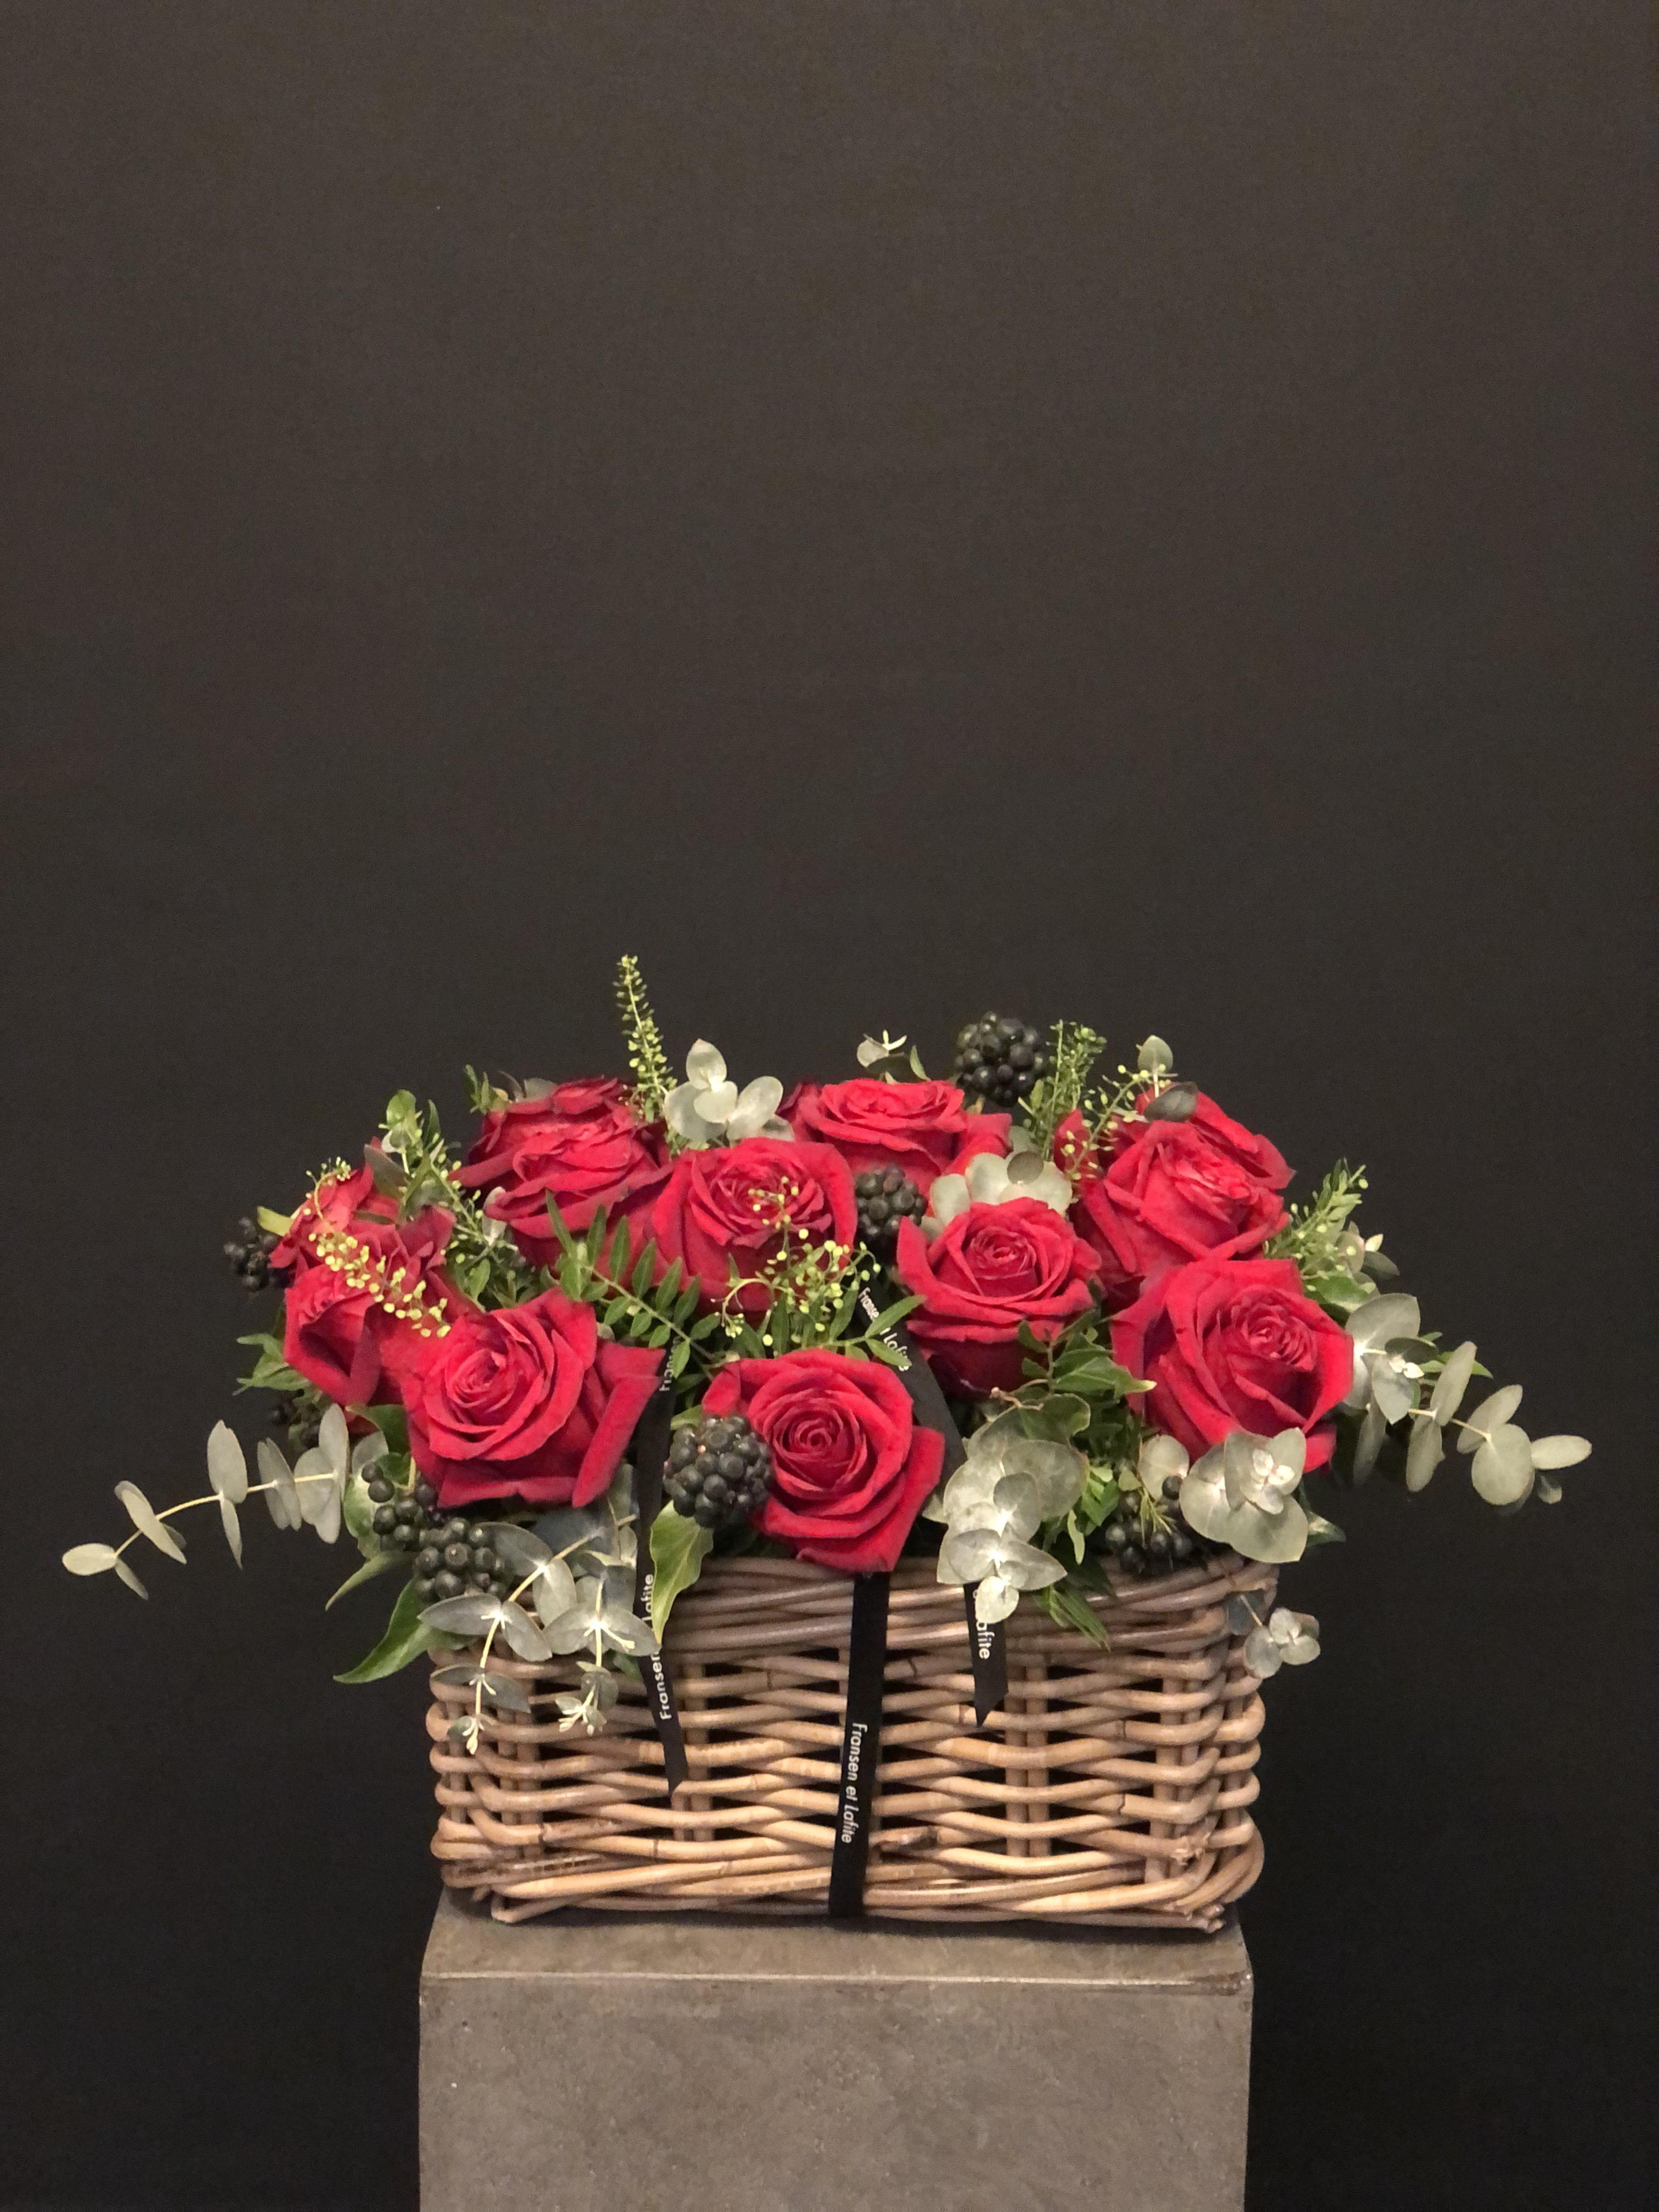 Cesta San Valentin con rosas rojas